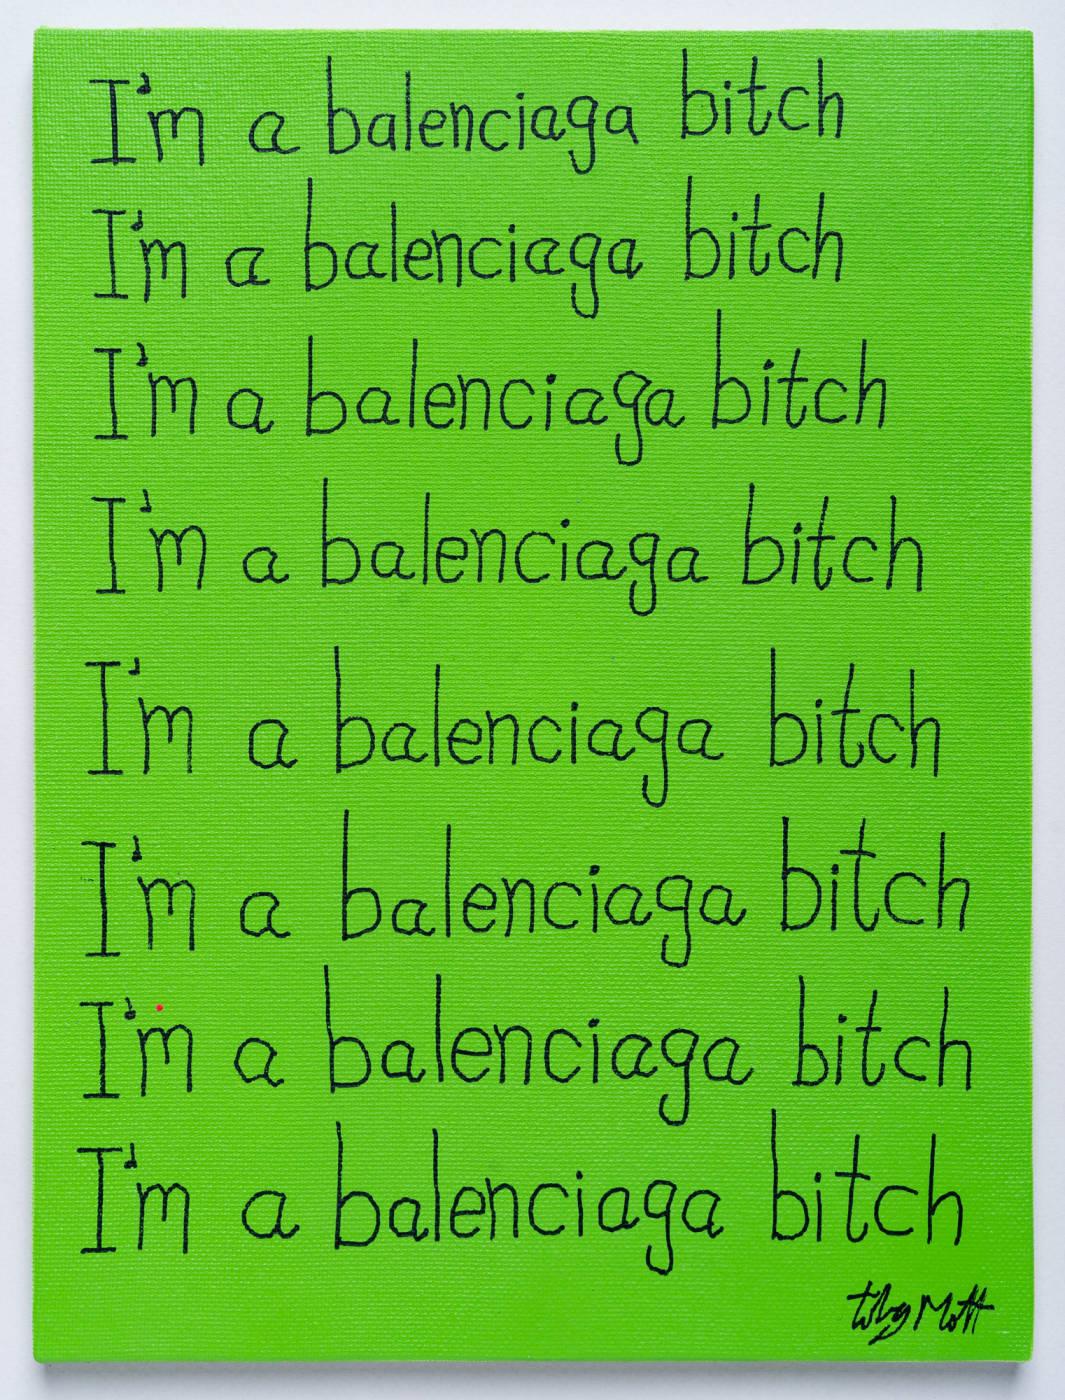 I'm a balenciaga bitch